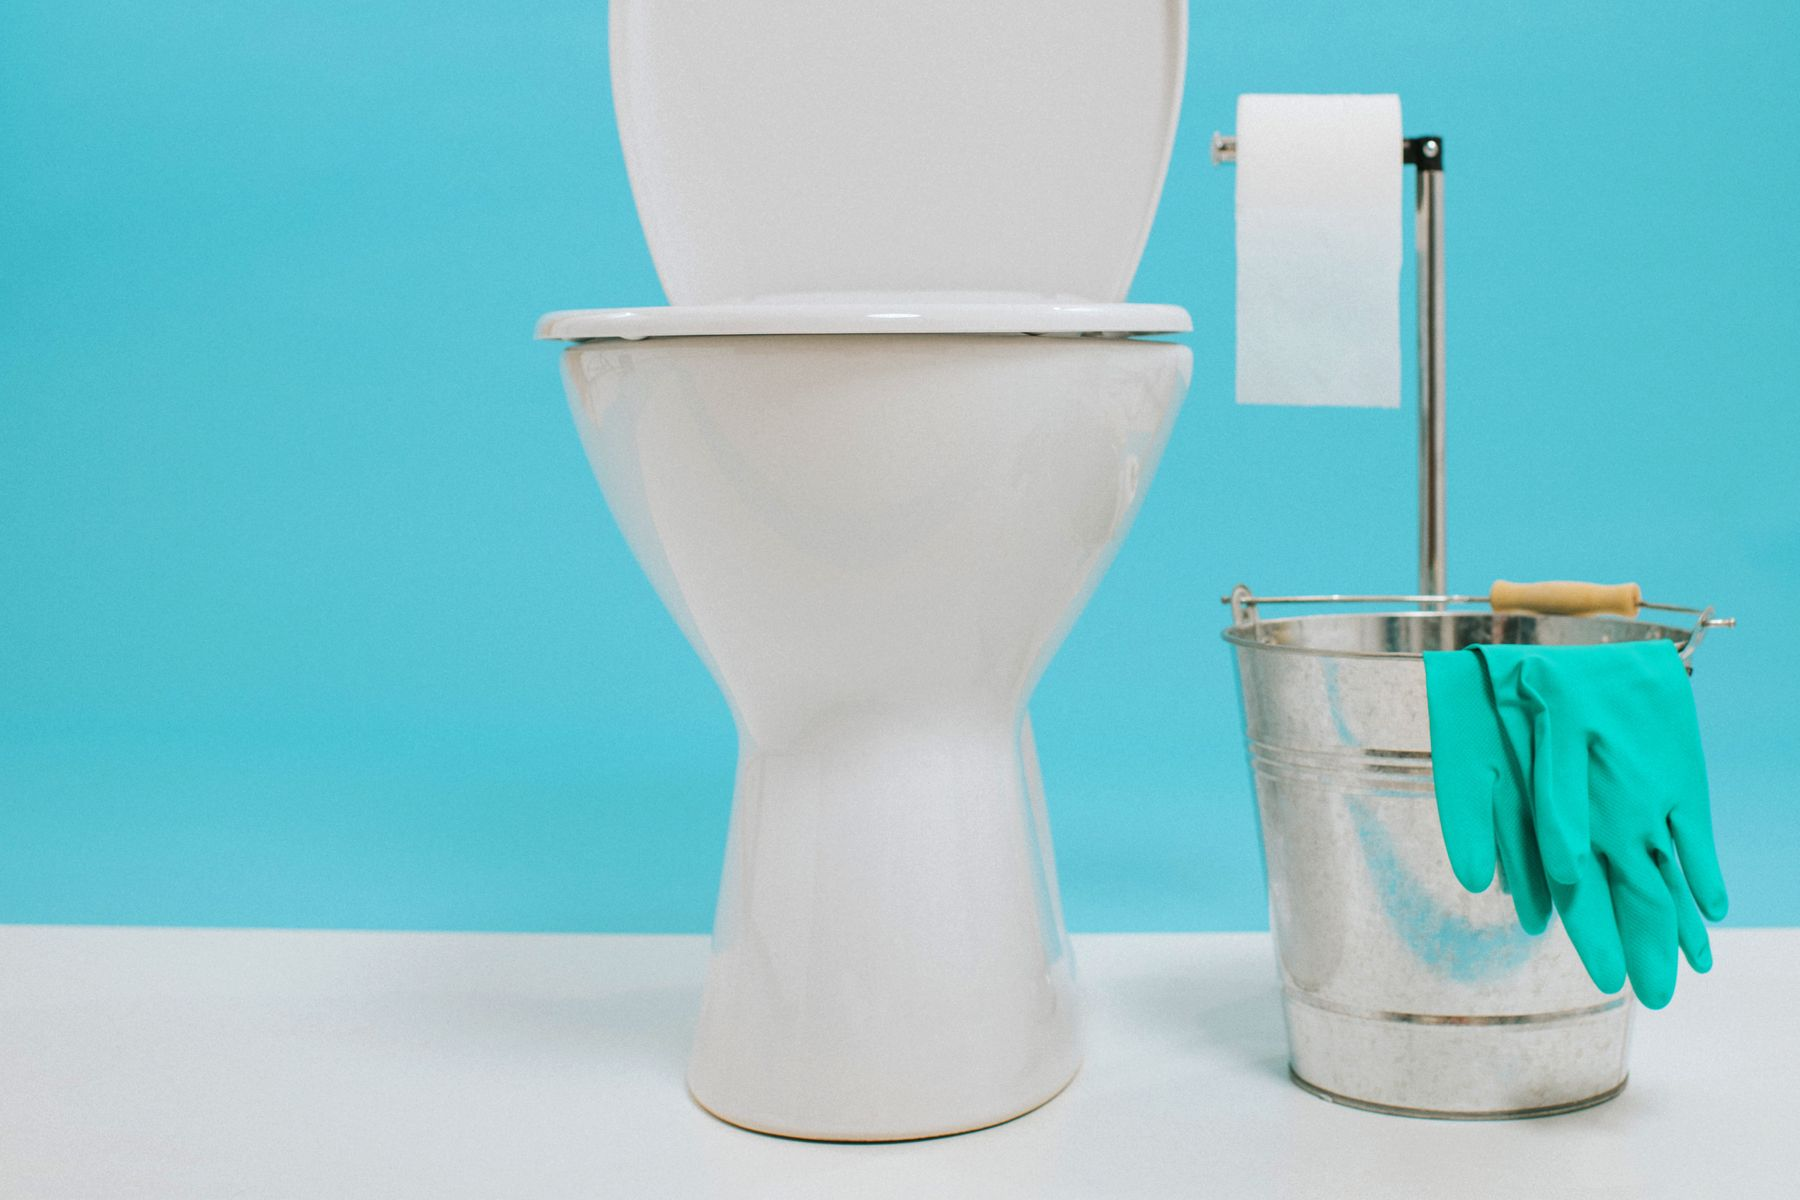 limpiar-el-inodoro